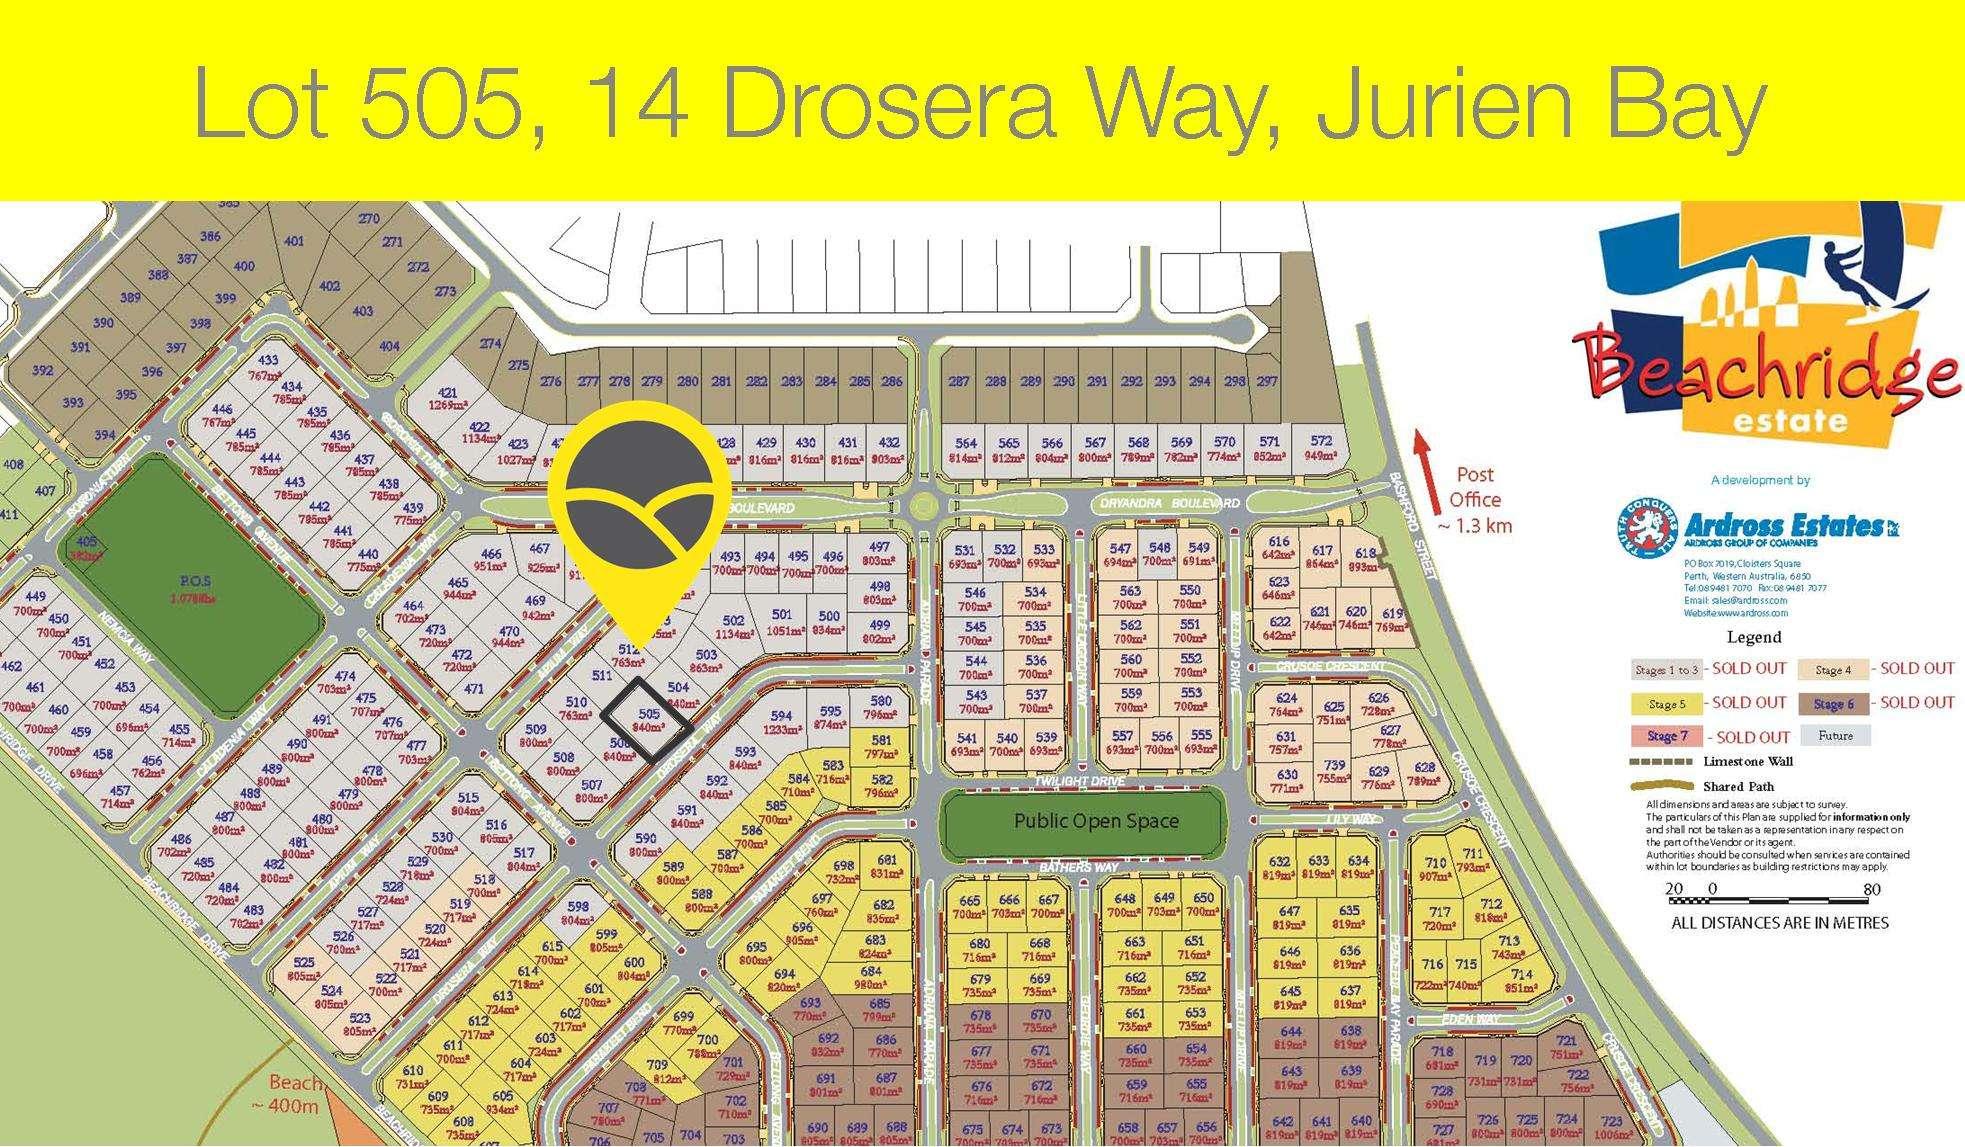 14 Drosera Way, Jurien Bay, WA 6516